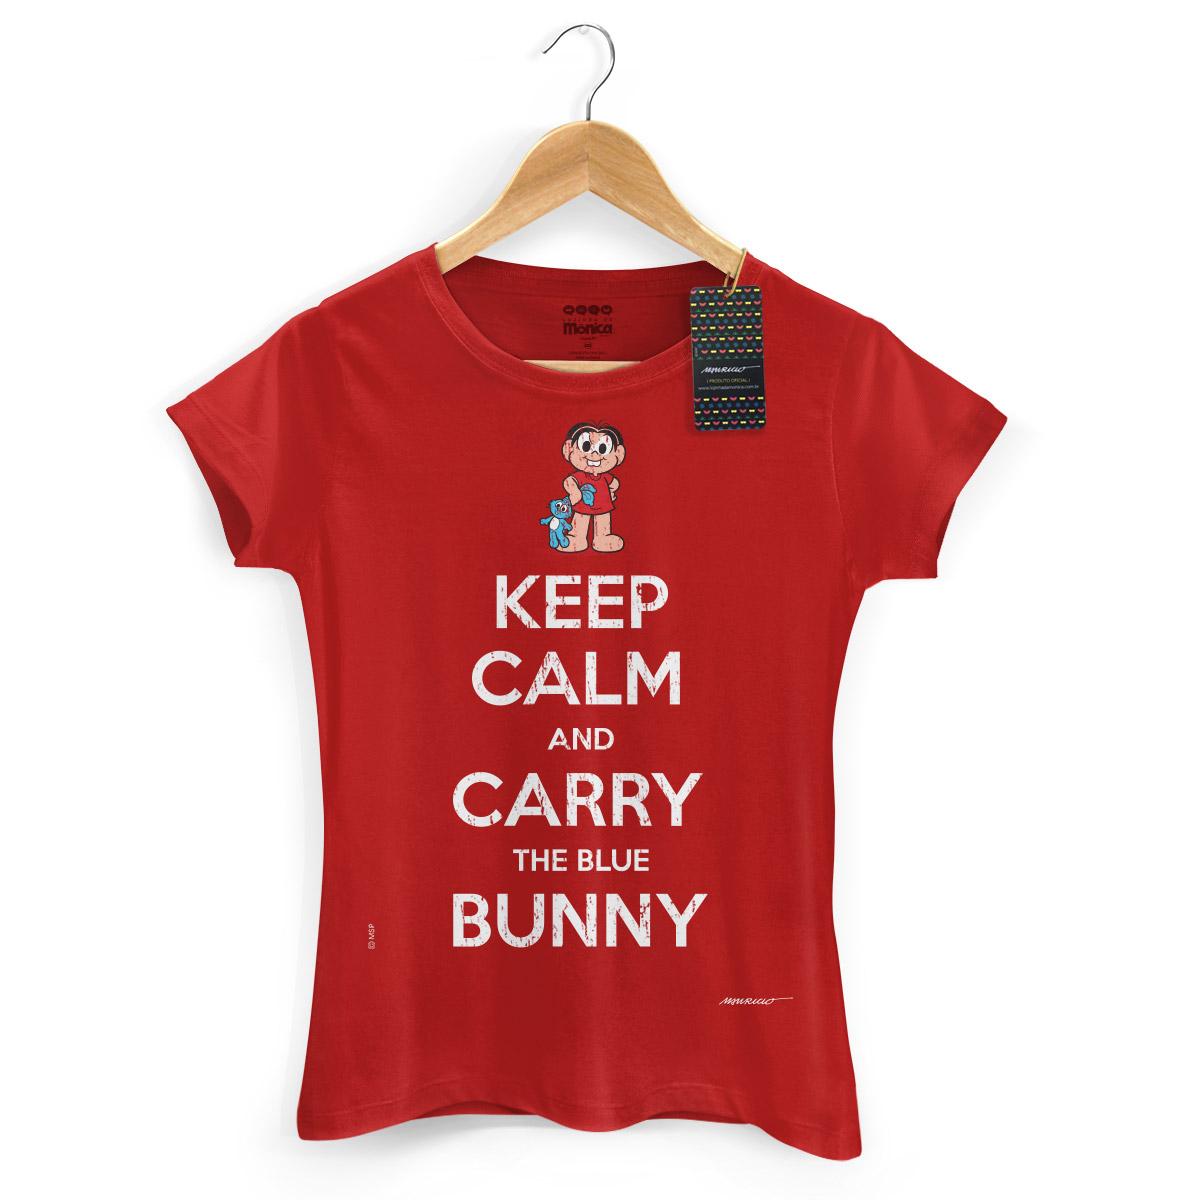 Camiseta Feminina Turma da Mônica Cool Keep Calm And Carry The Blue Bunny